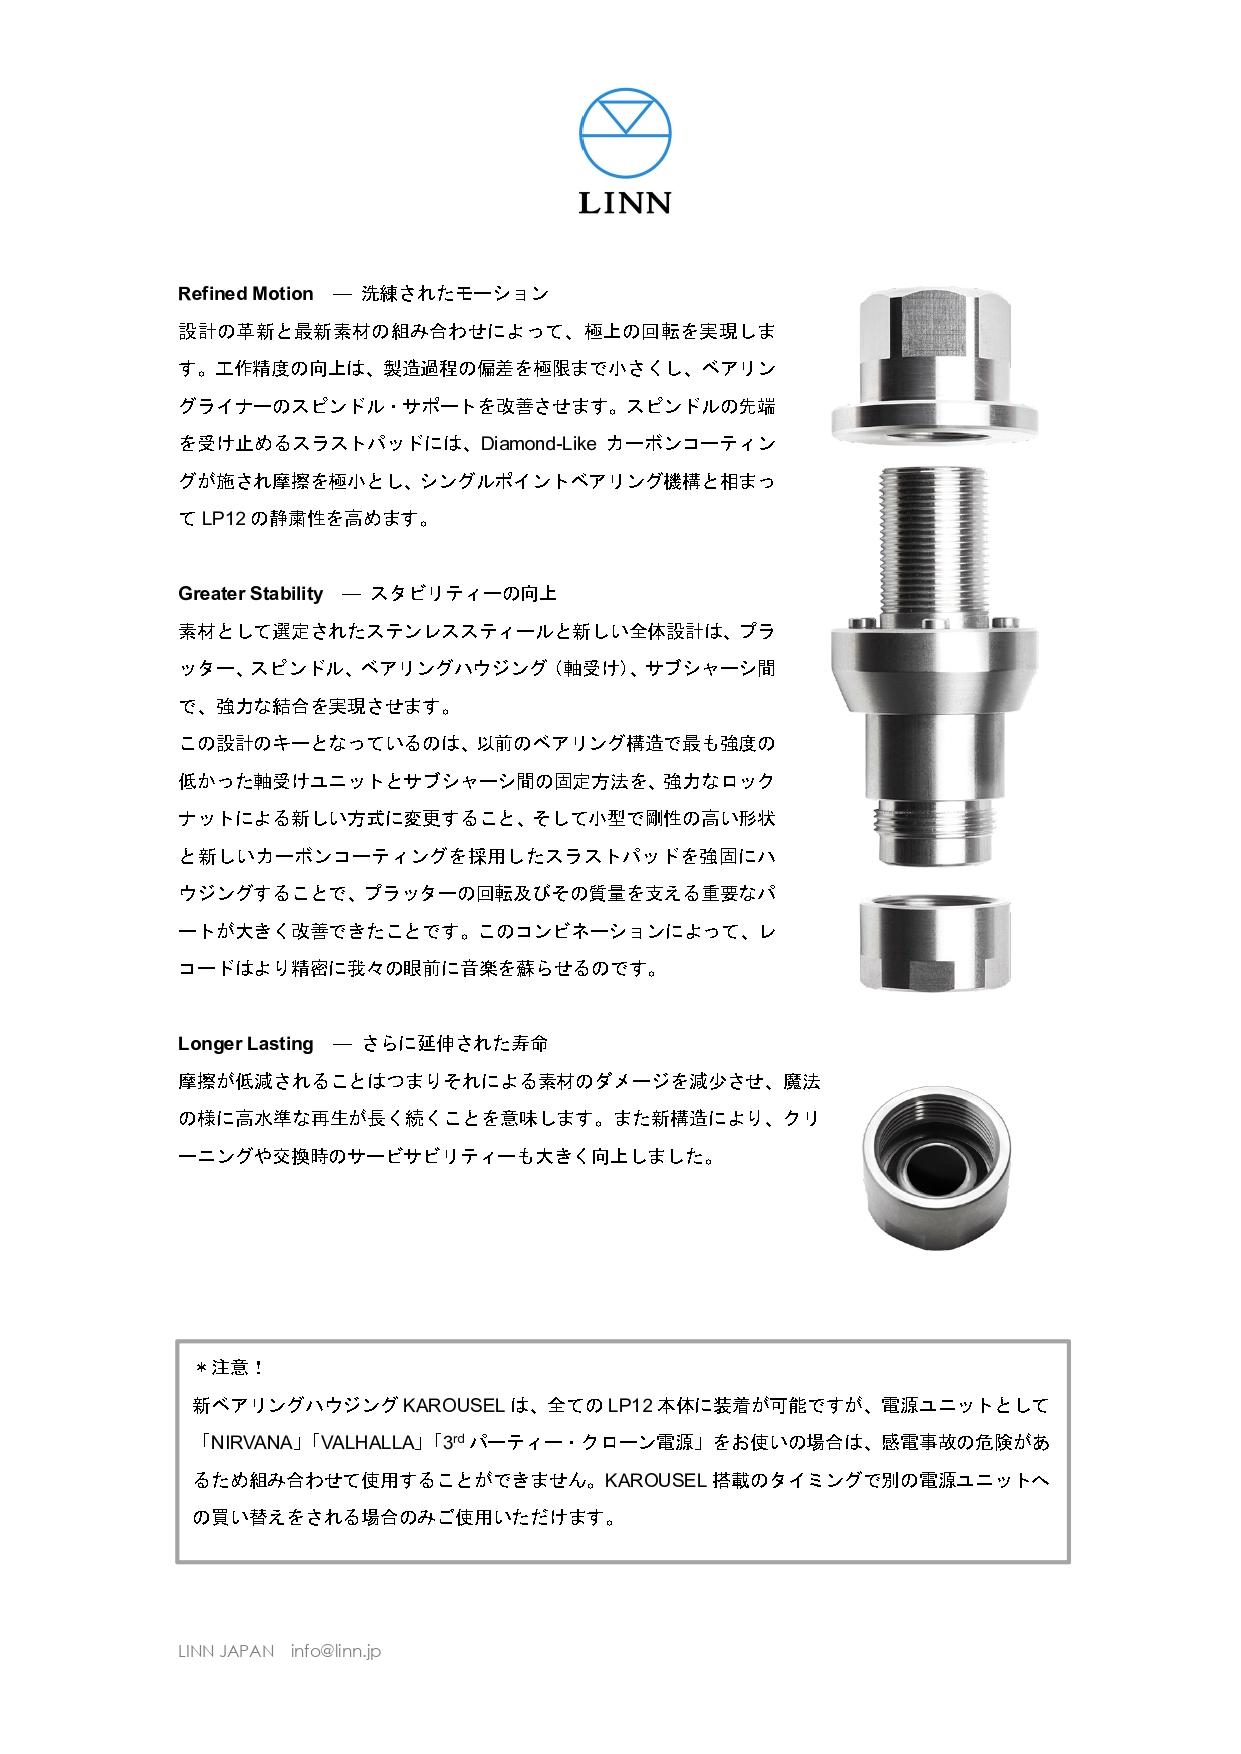 Karousel__page-0003.jpg